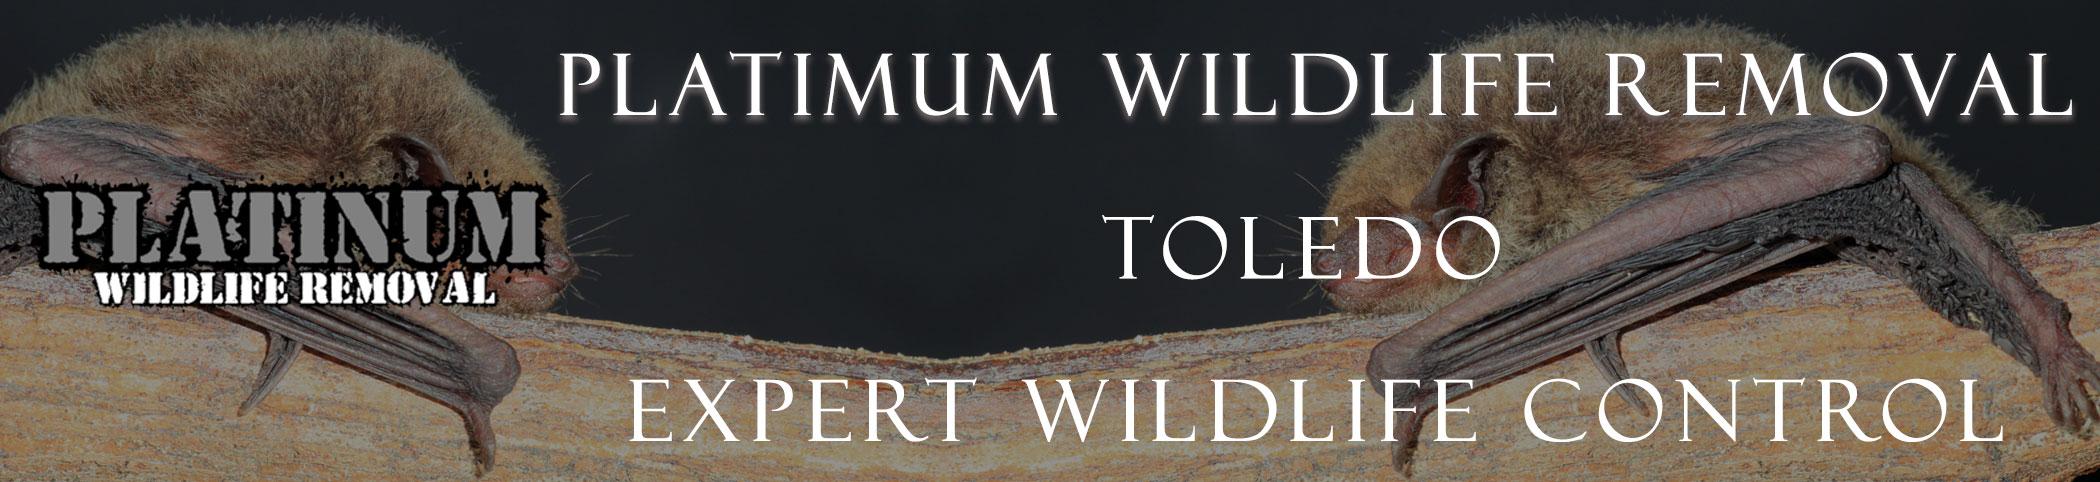 Platinum-Wildlife-Removal_Toledo-HEADERS at bat removal pro